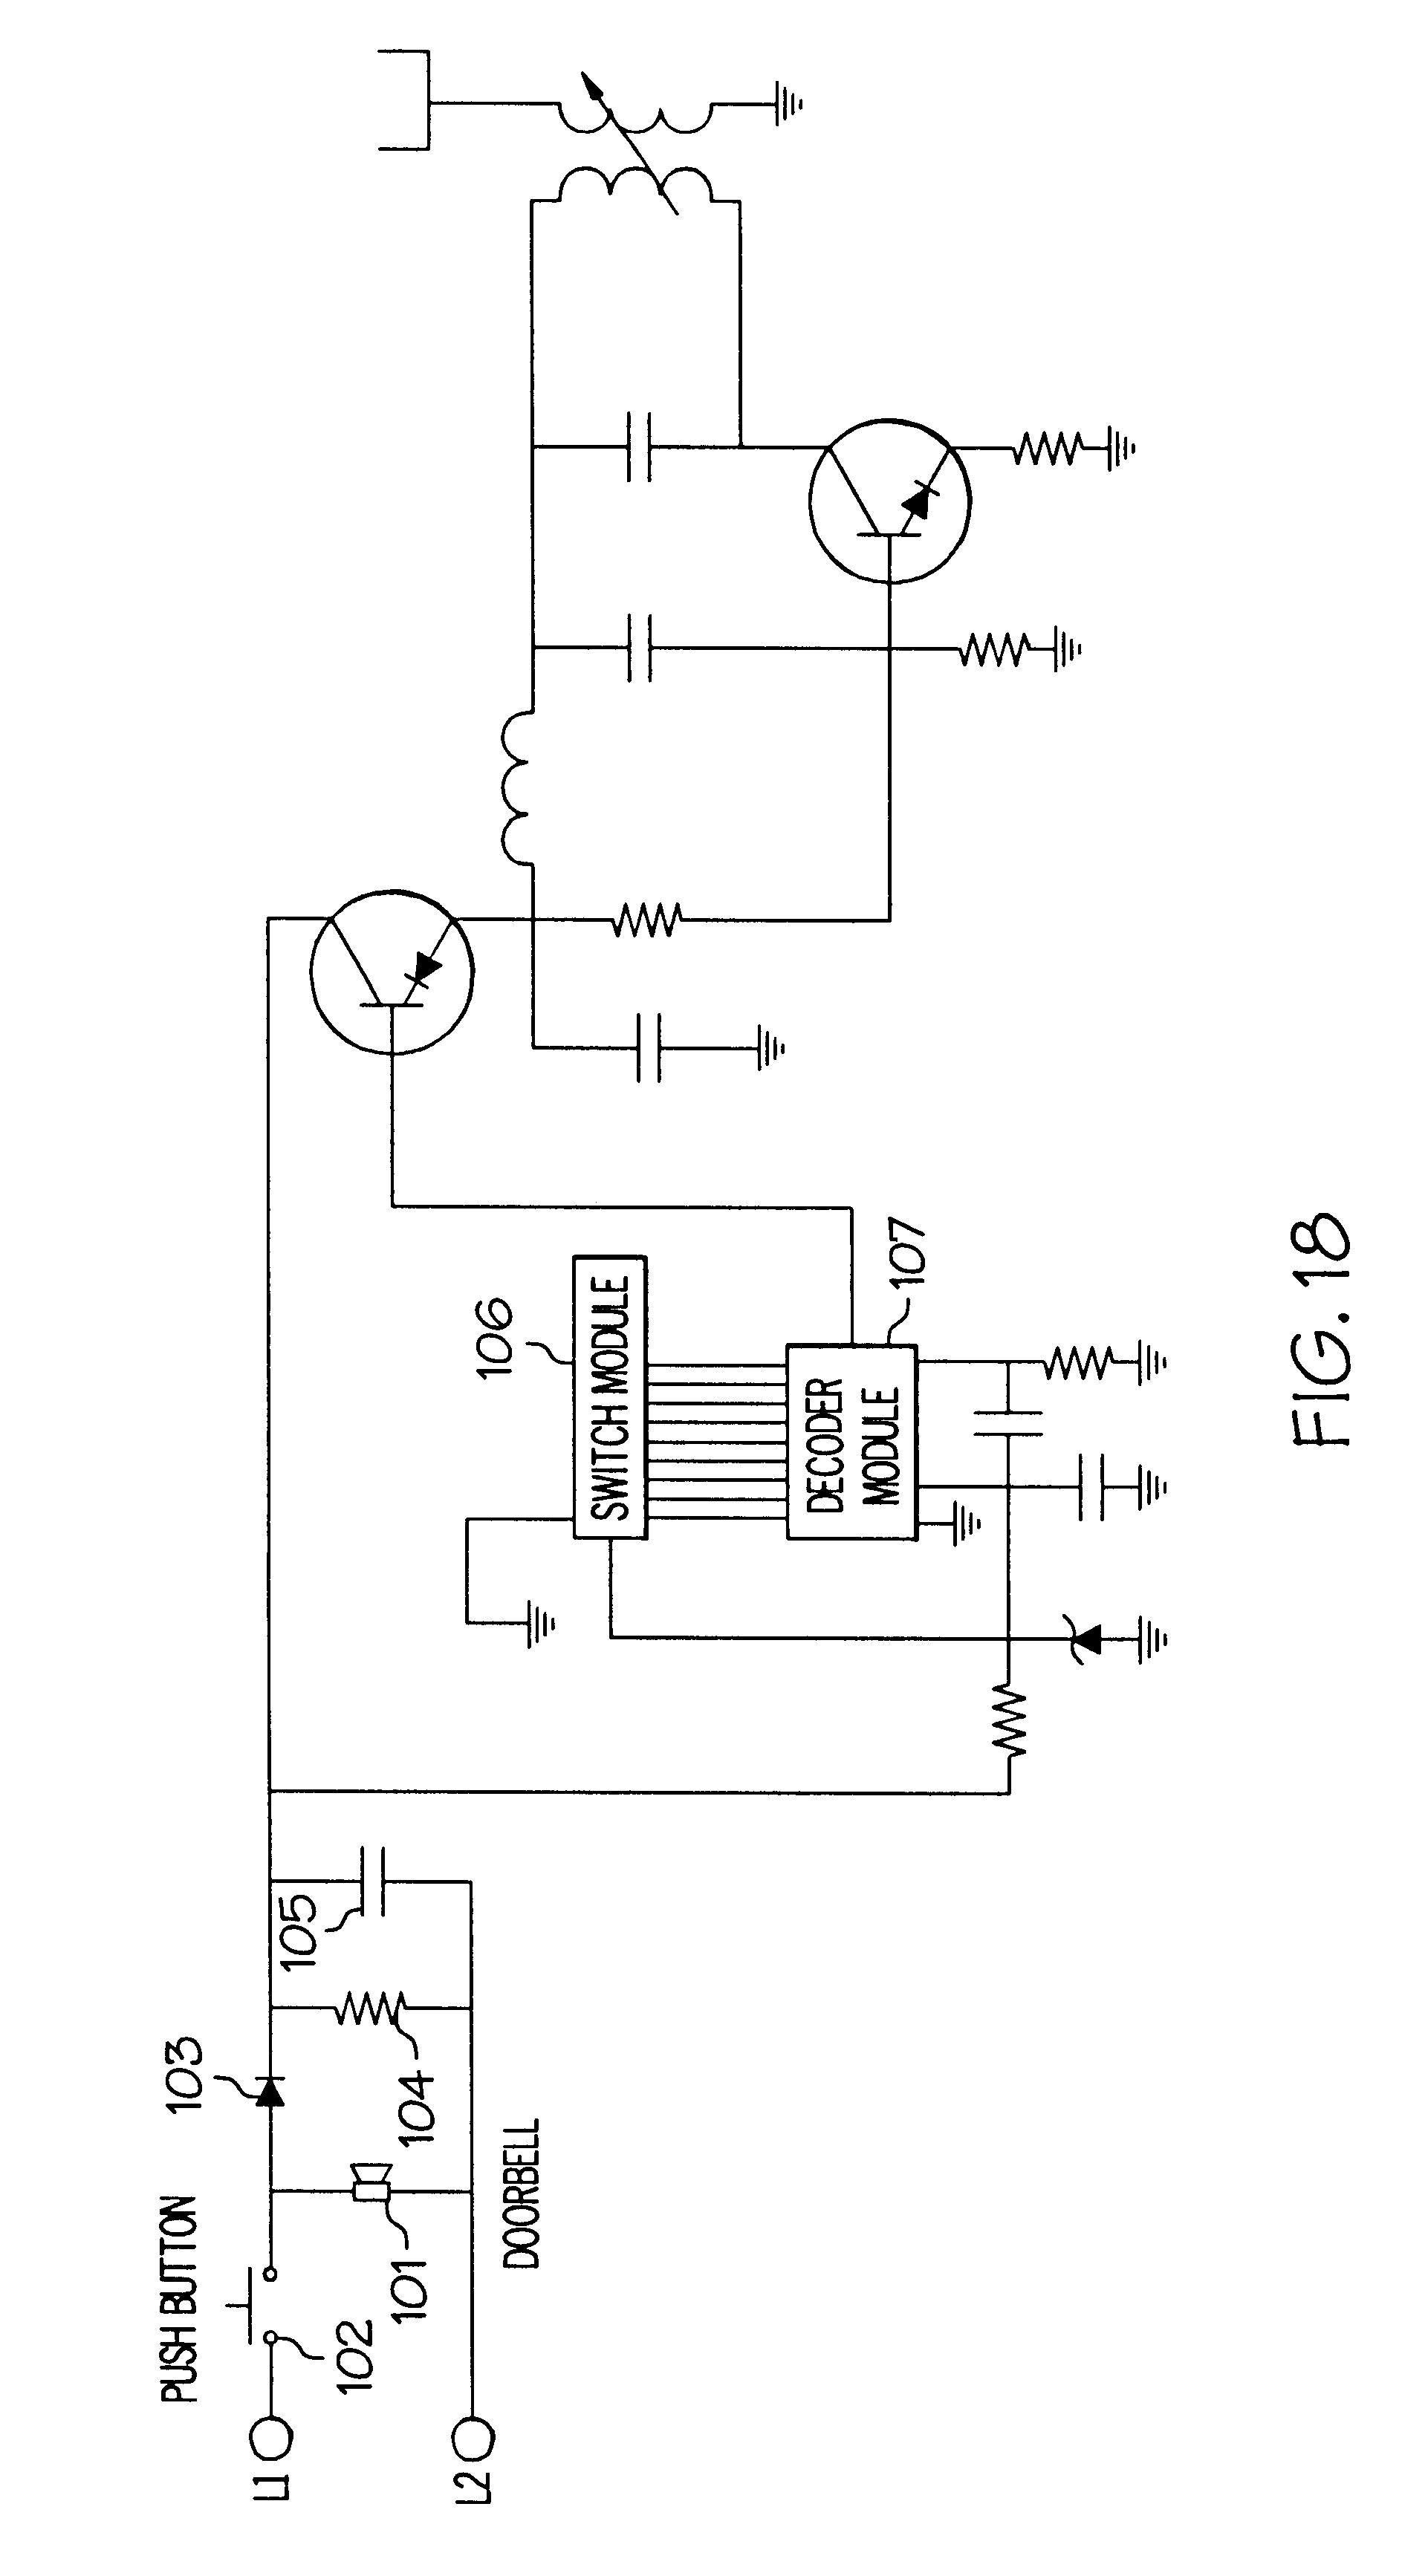 Robbins Myers Motor Wiring Diagram from schematron.org